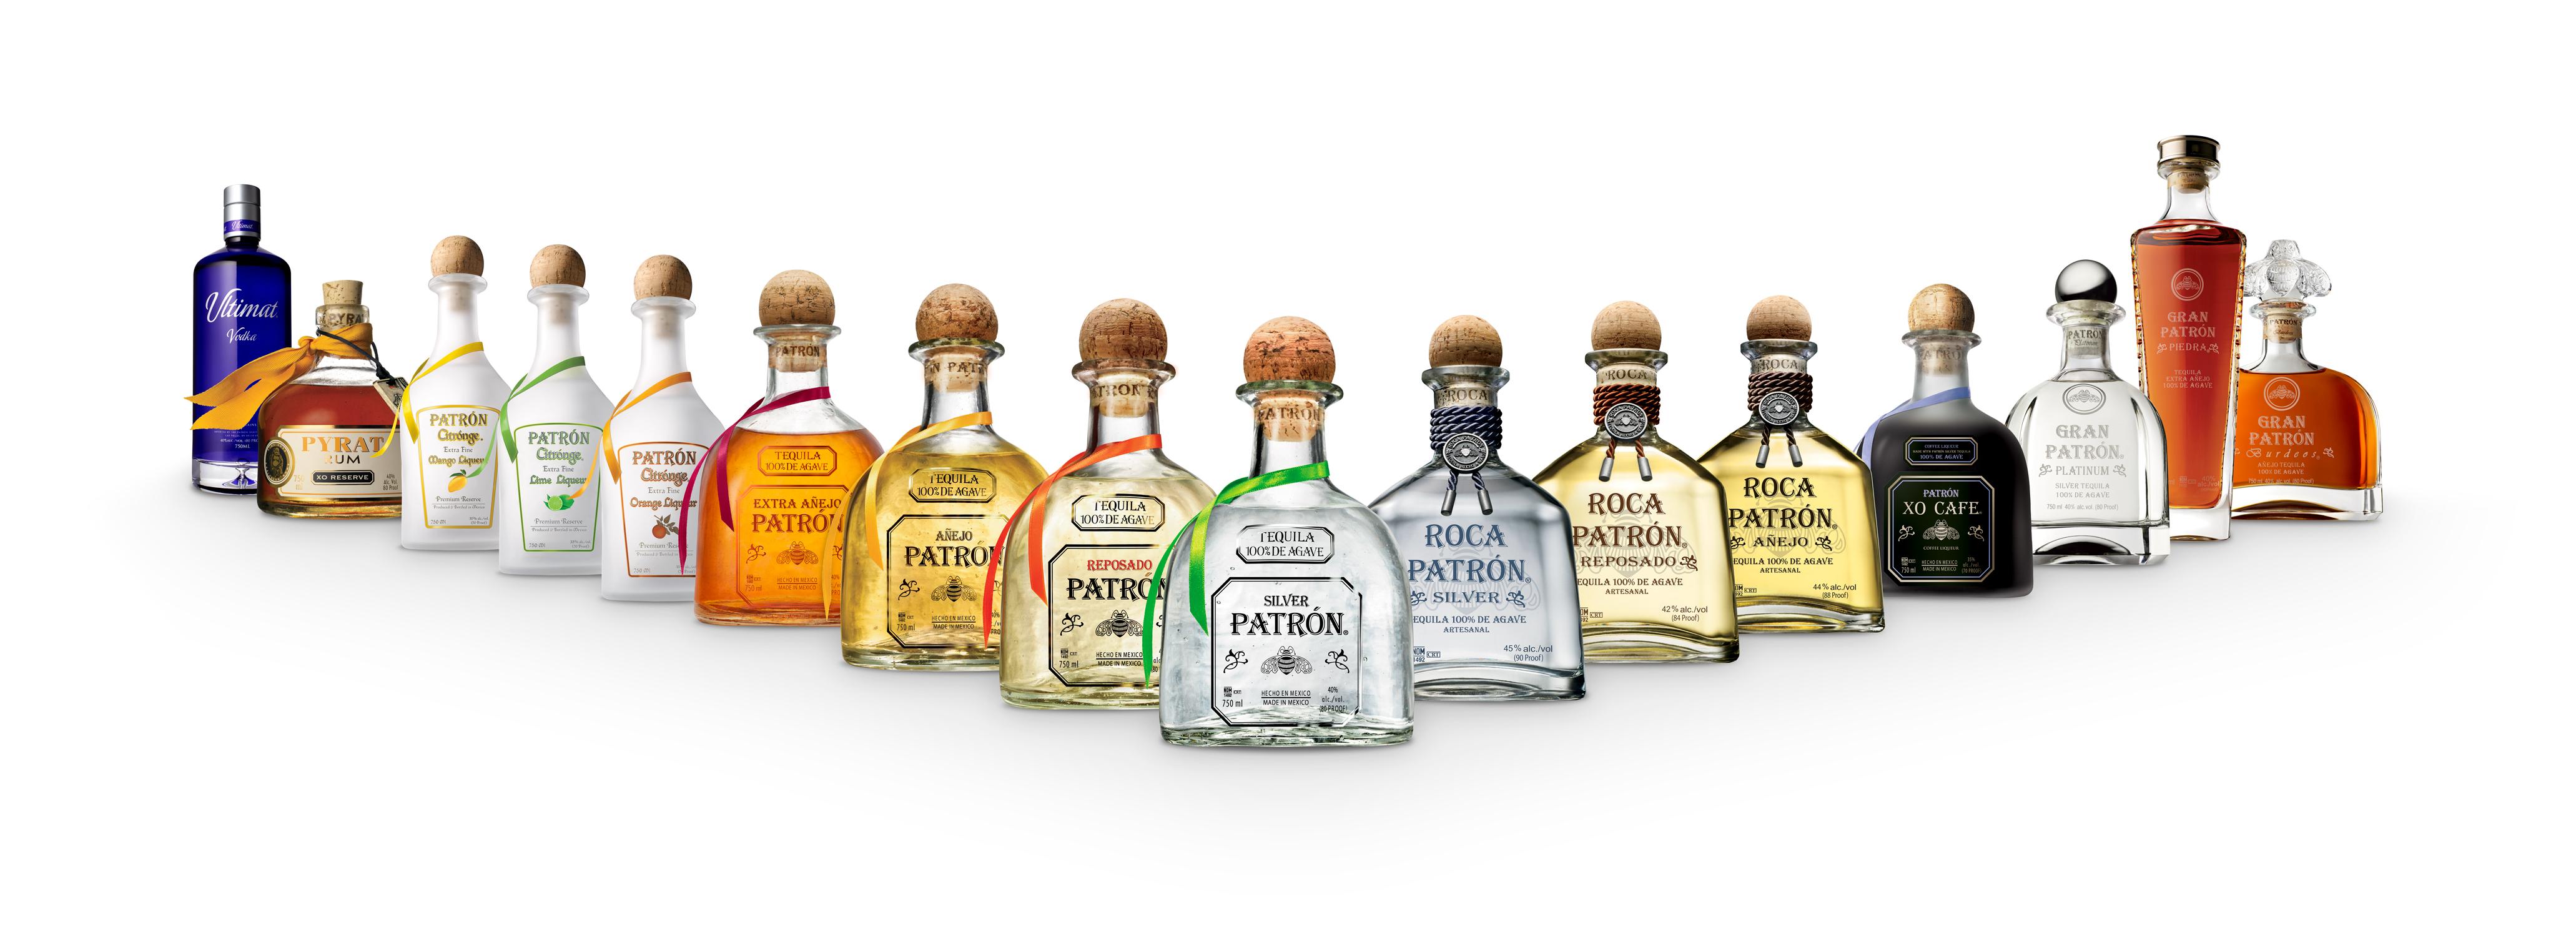 Bacardi to Acquire PATRÓN Tequila PATRON Portfolio 2017 Vform DMST 750ml